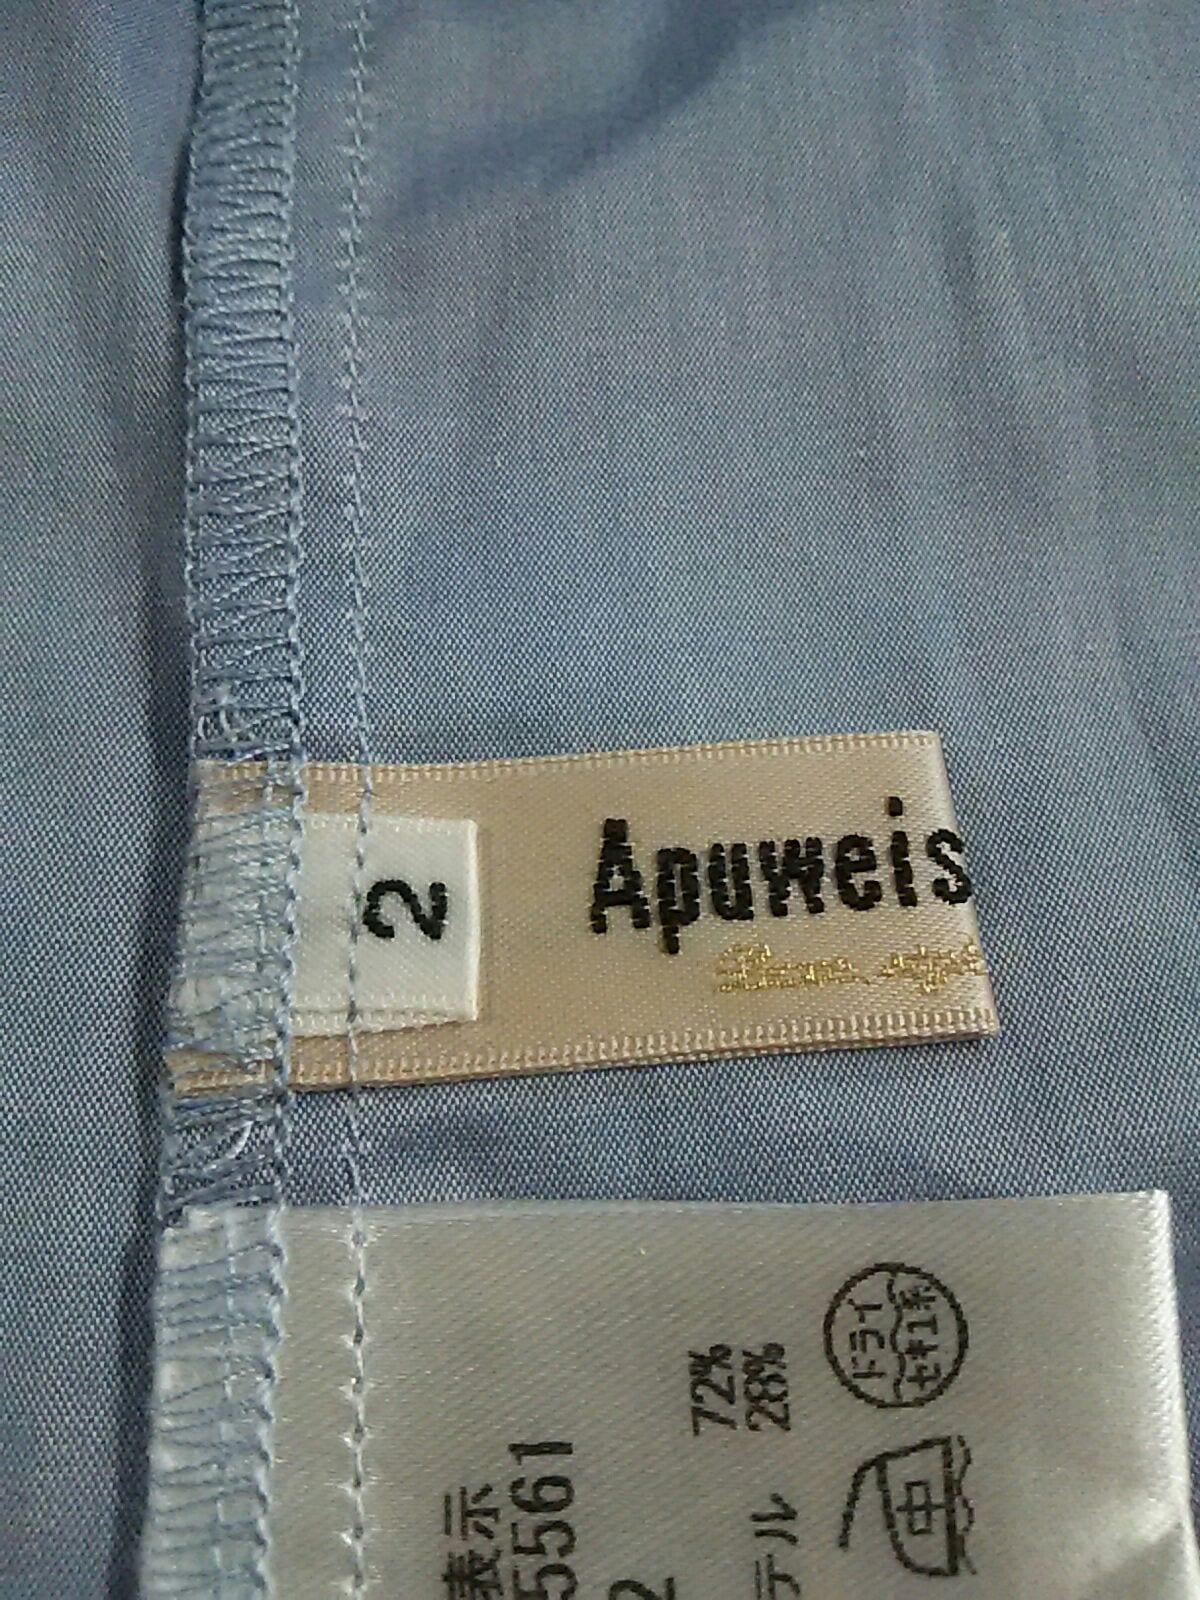 Apuweiser-riche(アプワイザーリッシェ)のスカートセットアップ